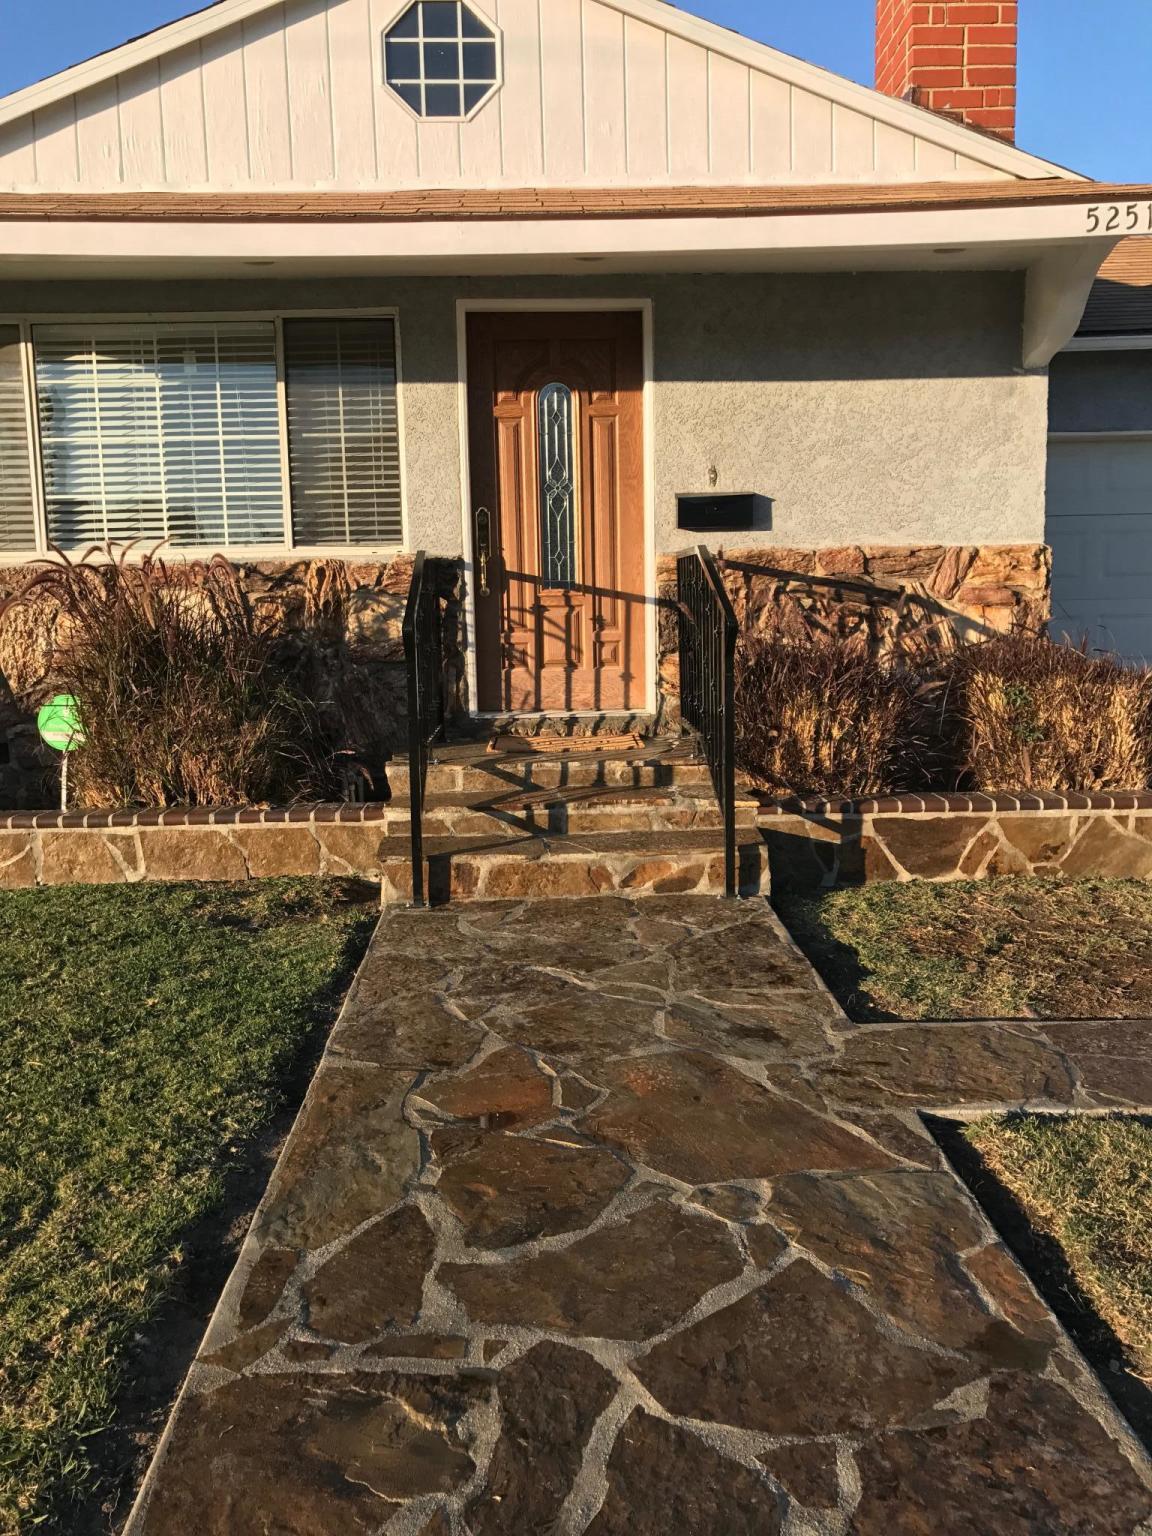 5251 W 124th St, Hawthorne, CA 90250 For Rent | Trulia